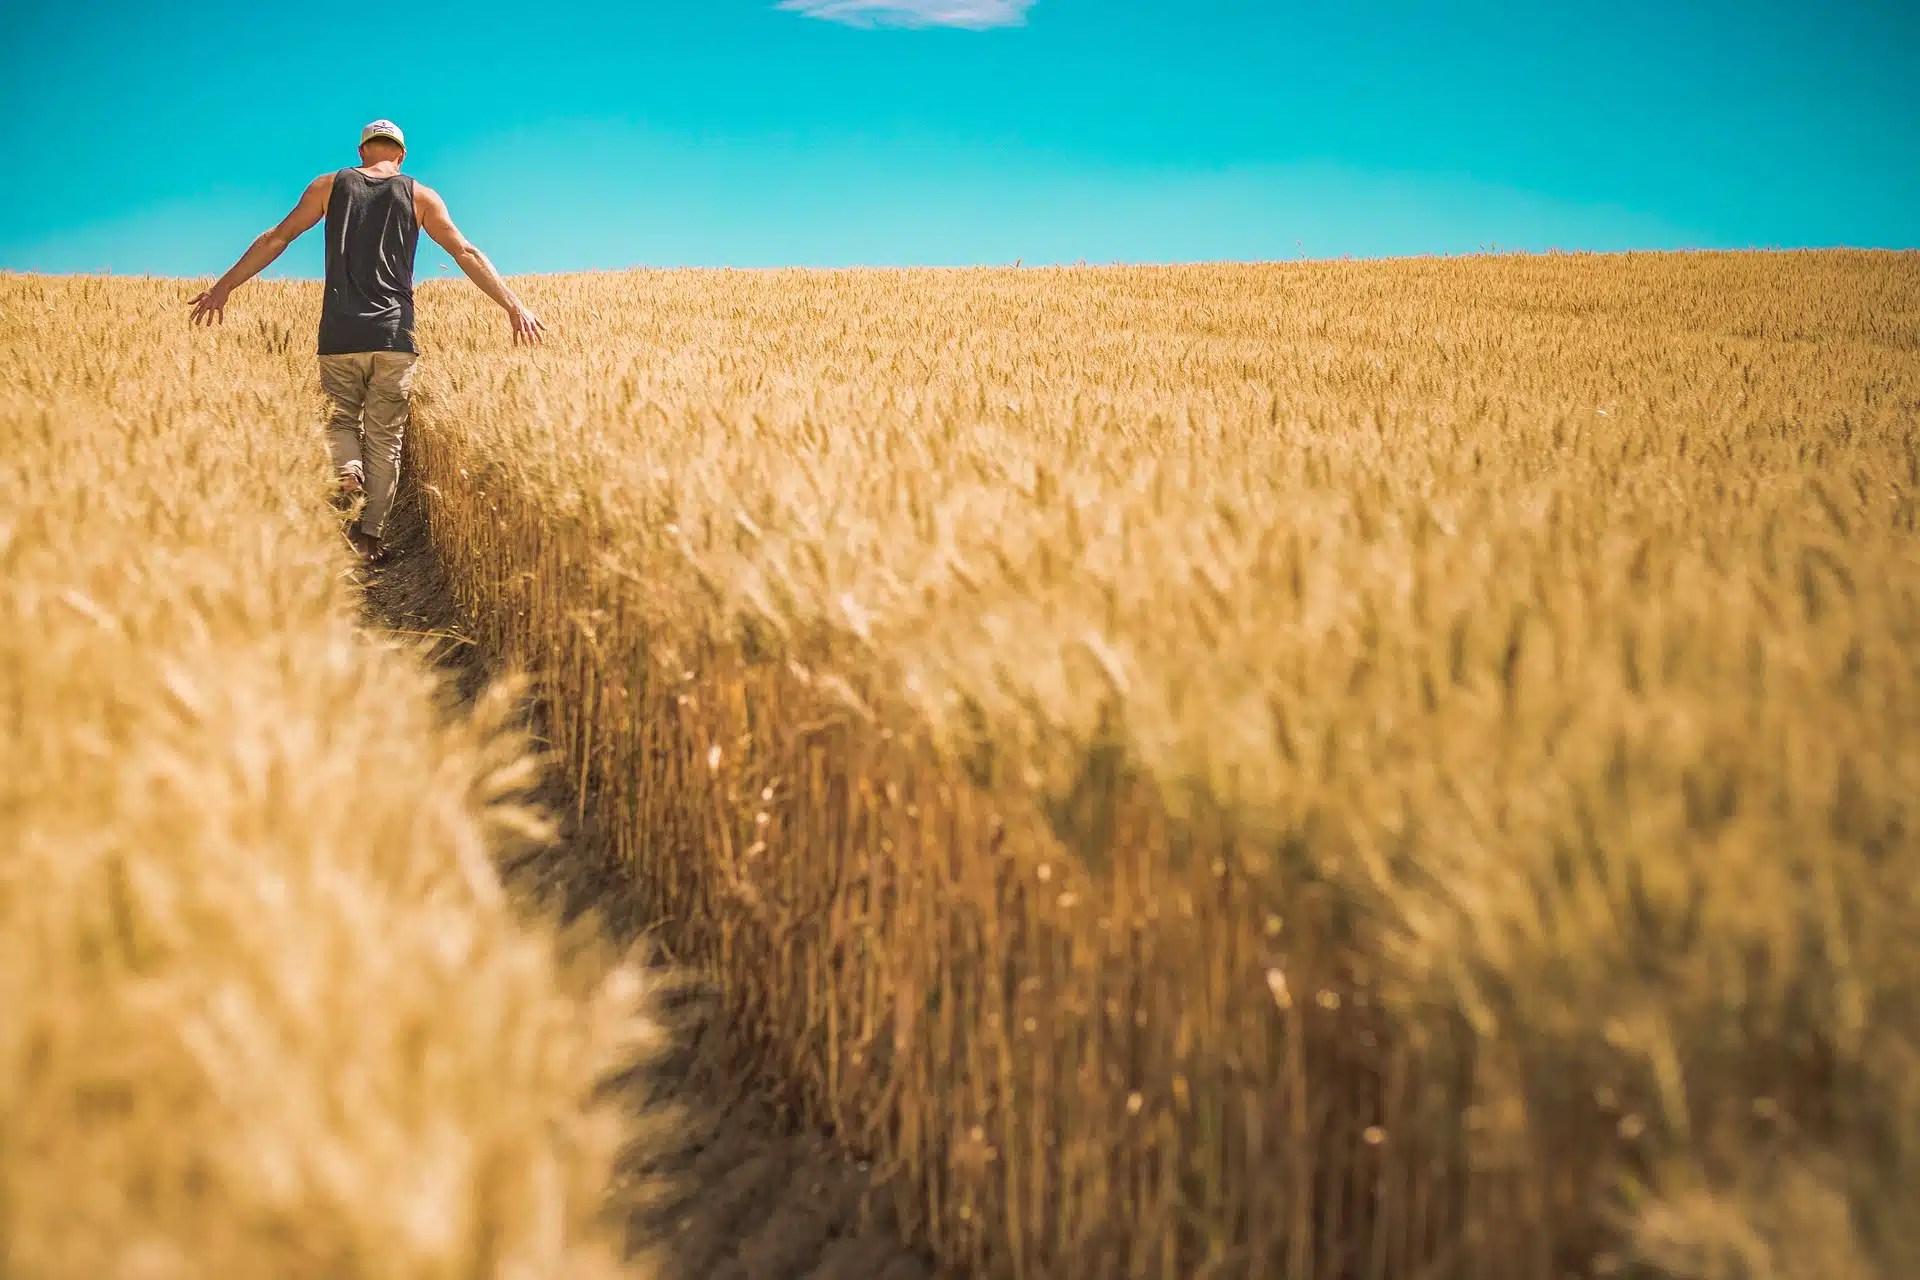 Man walking through wheat field